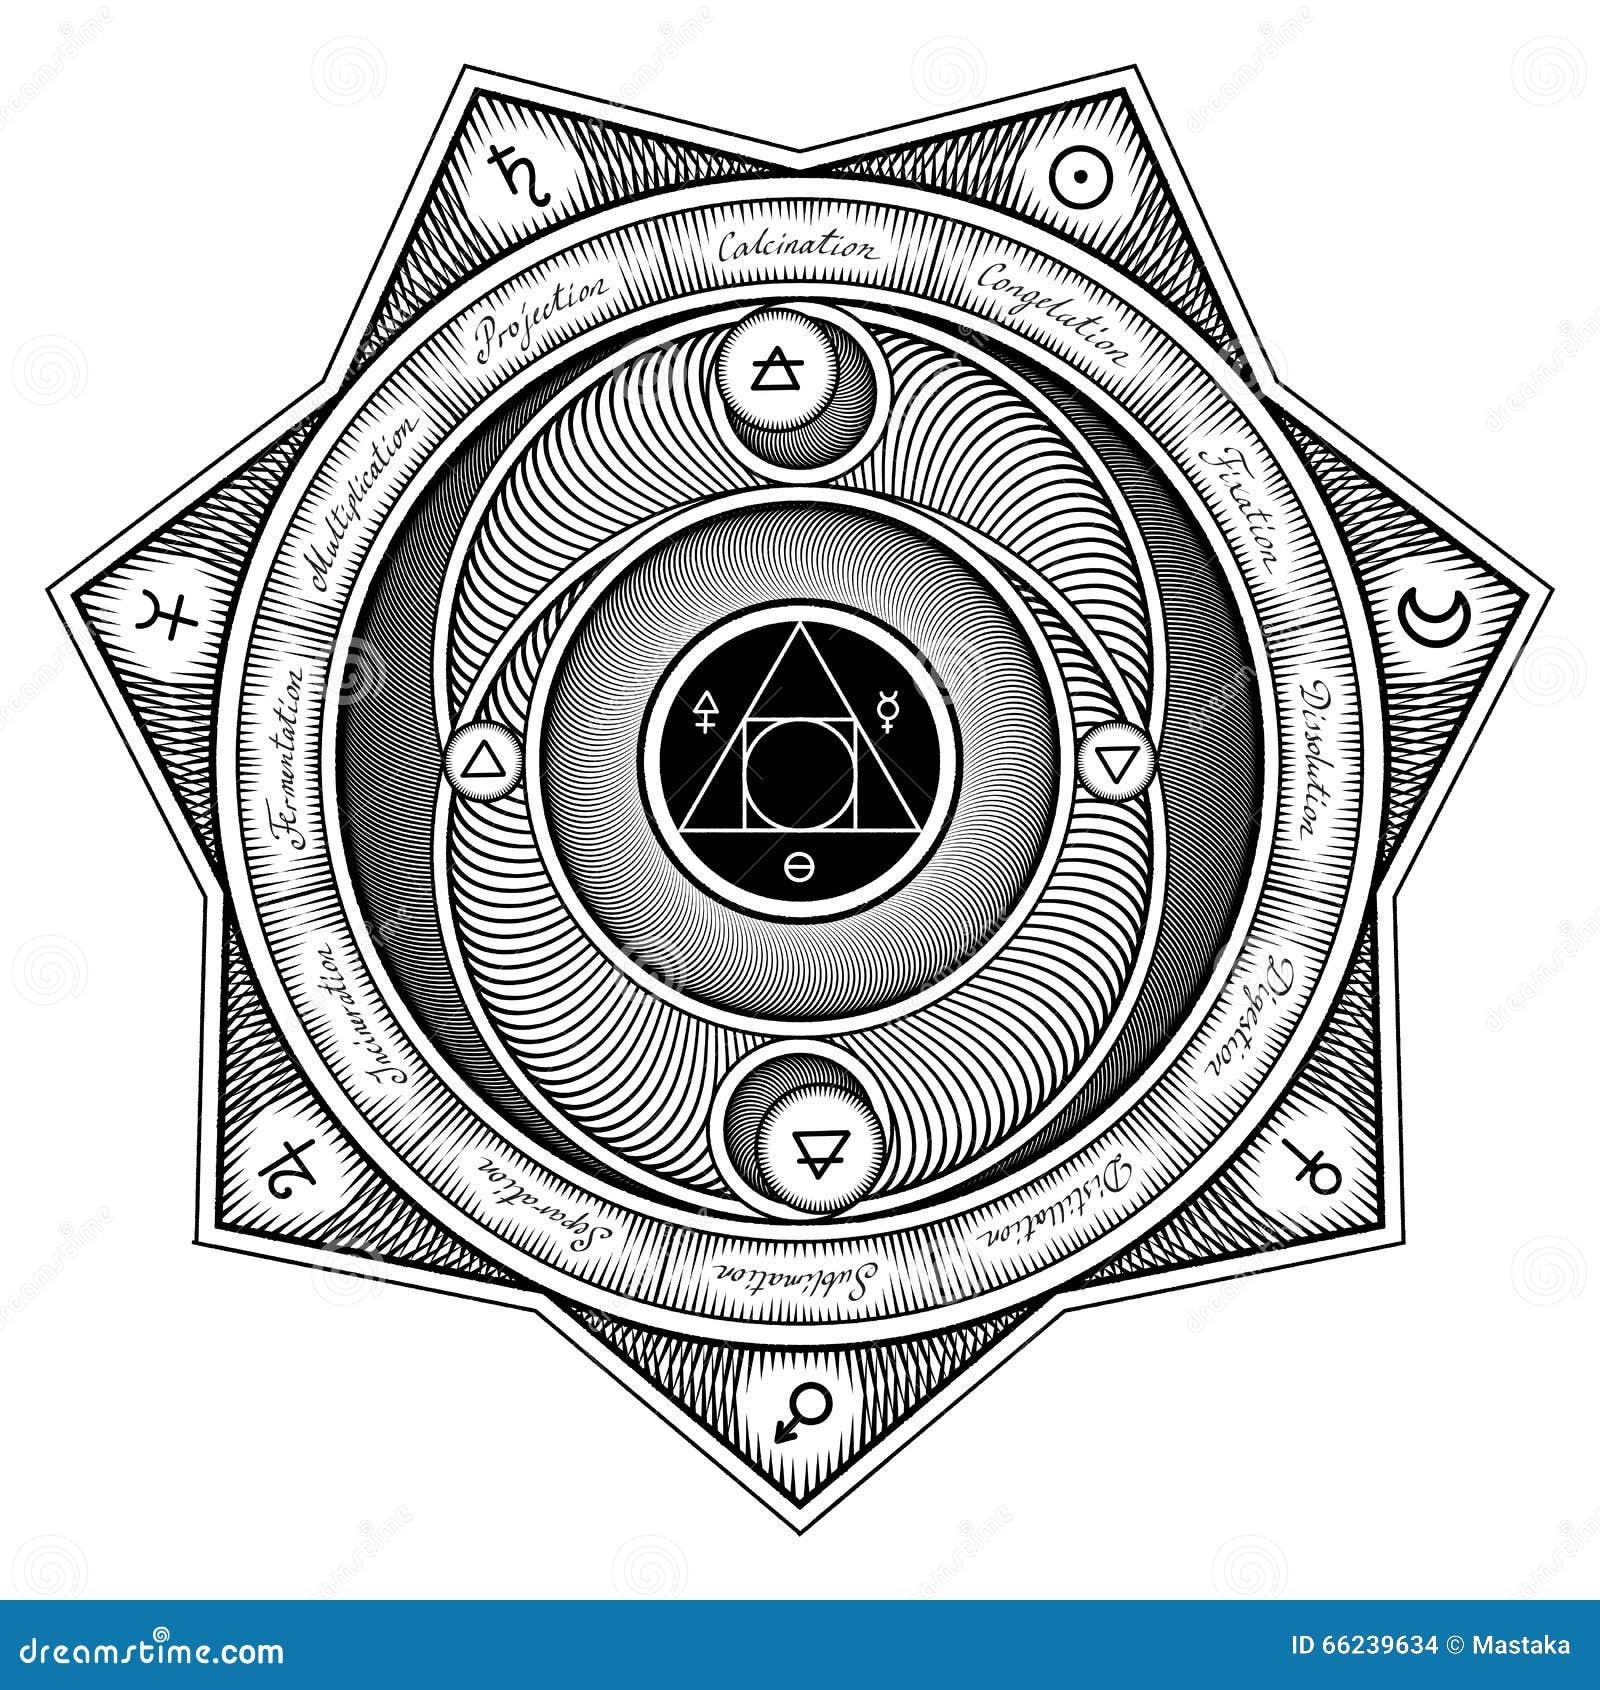 Alchemical Symbols Interaction Sheme - Vector Illustration Styling